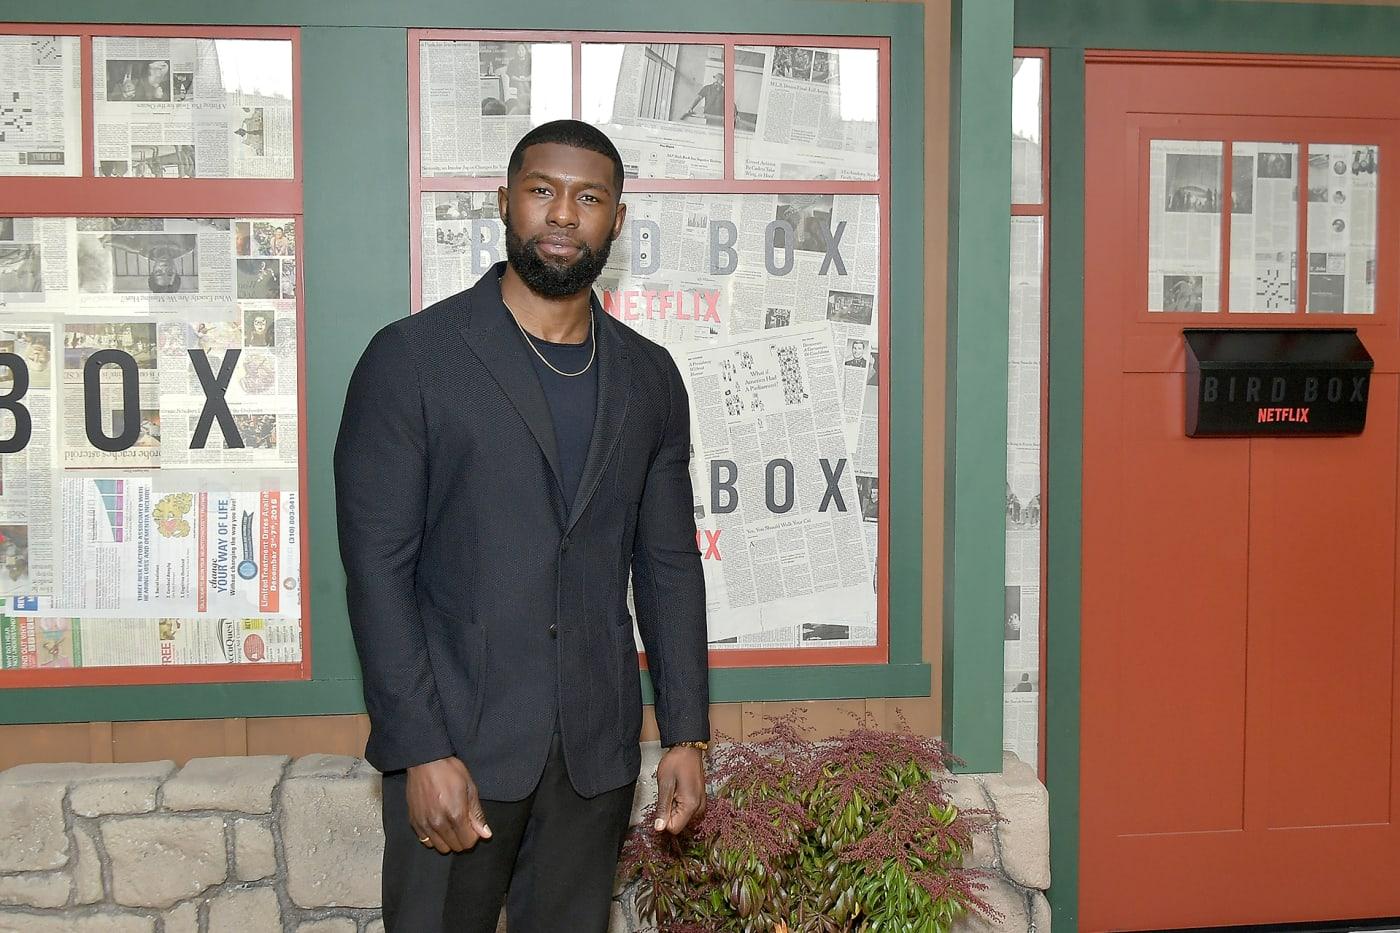 Trevante Rhodes at 'Bird Box' New York screening